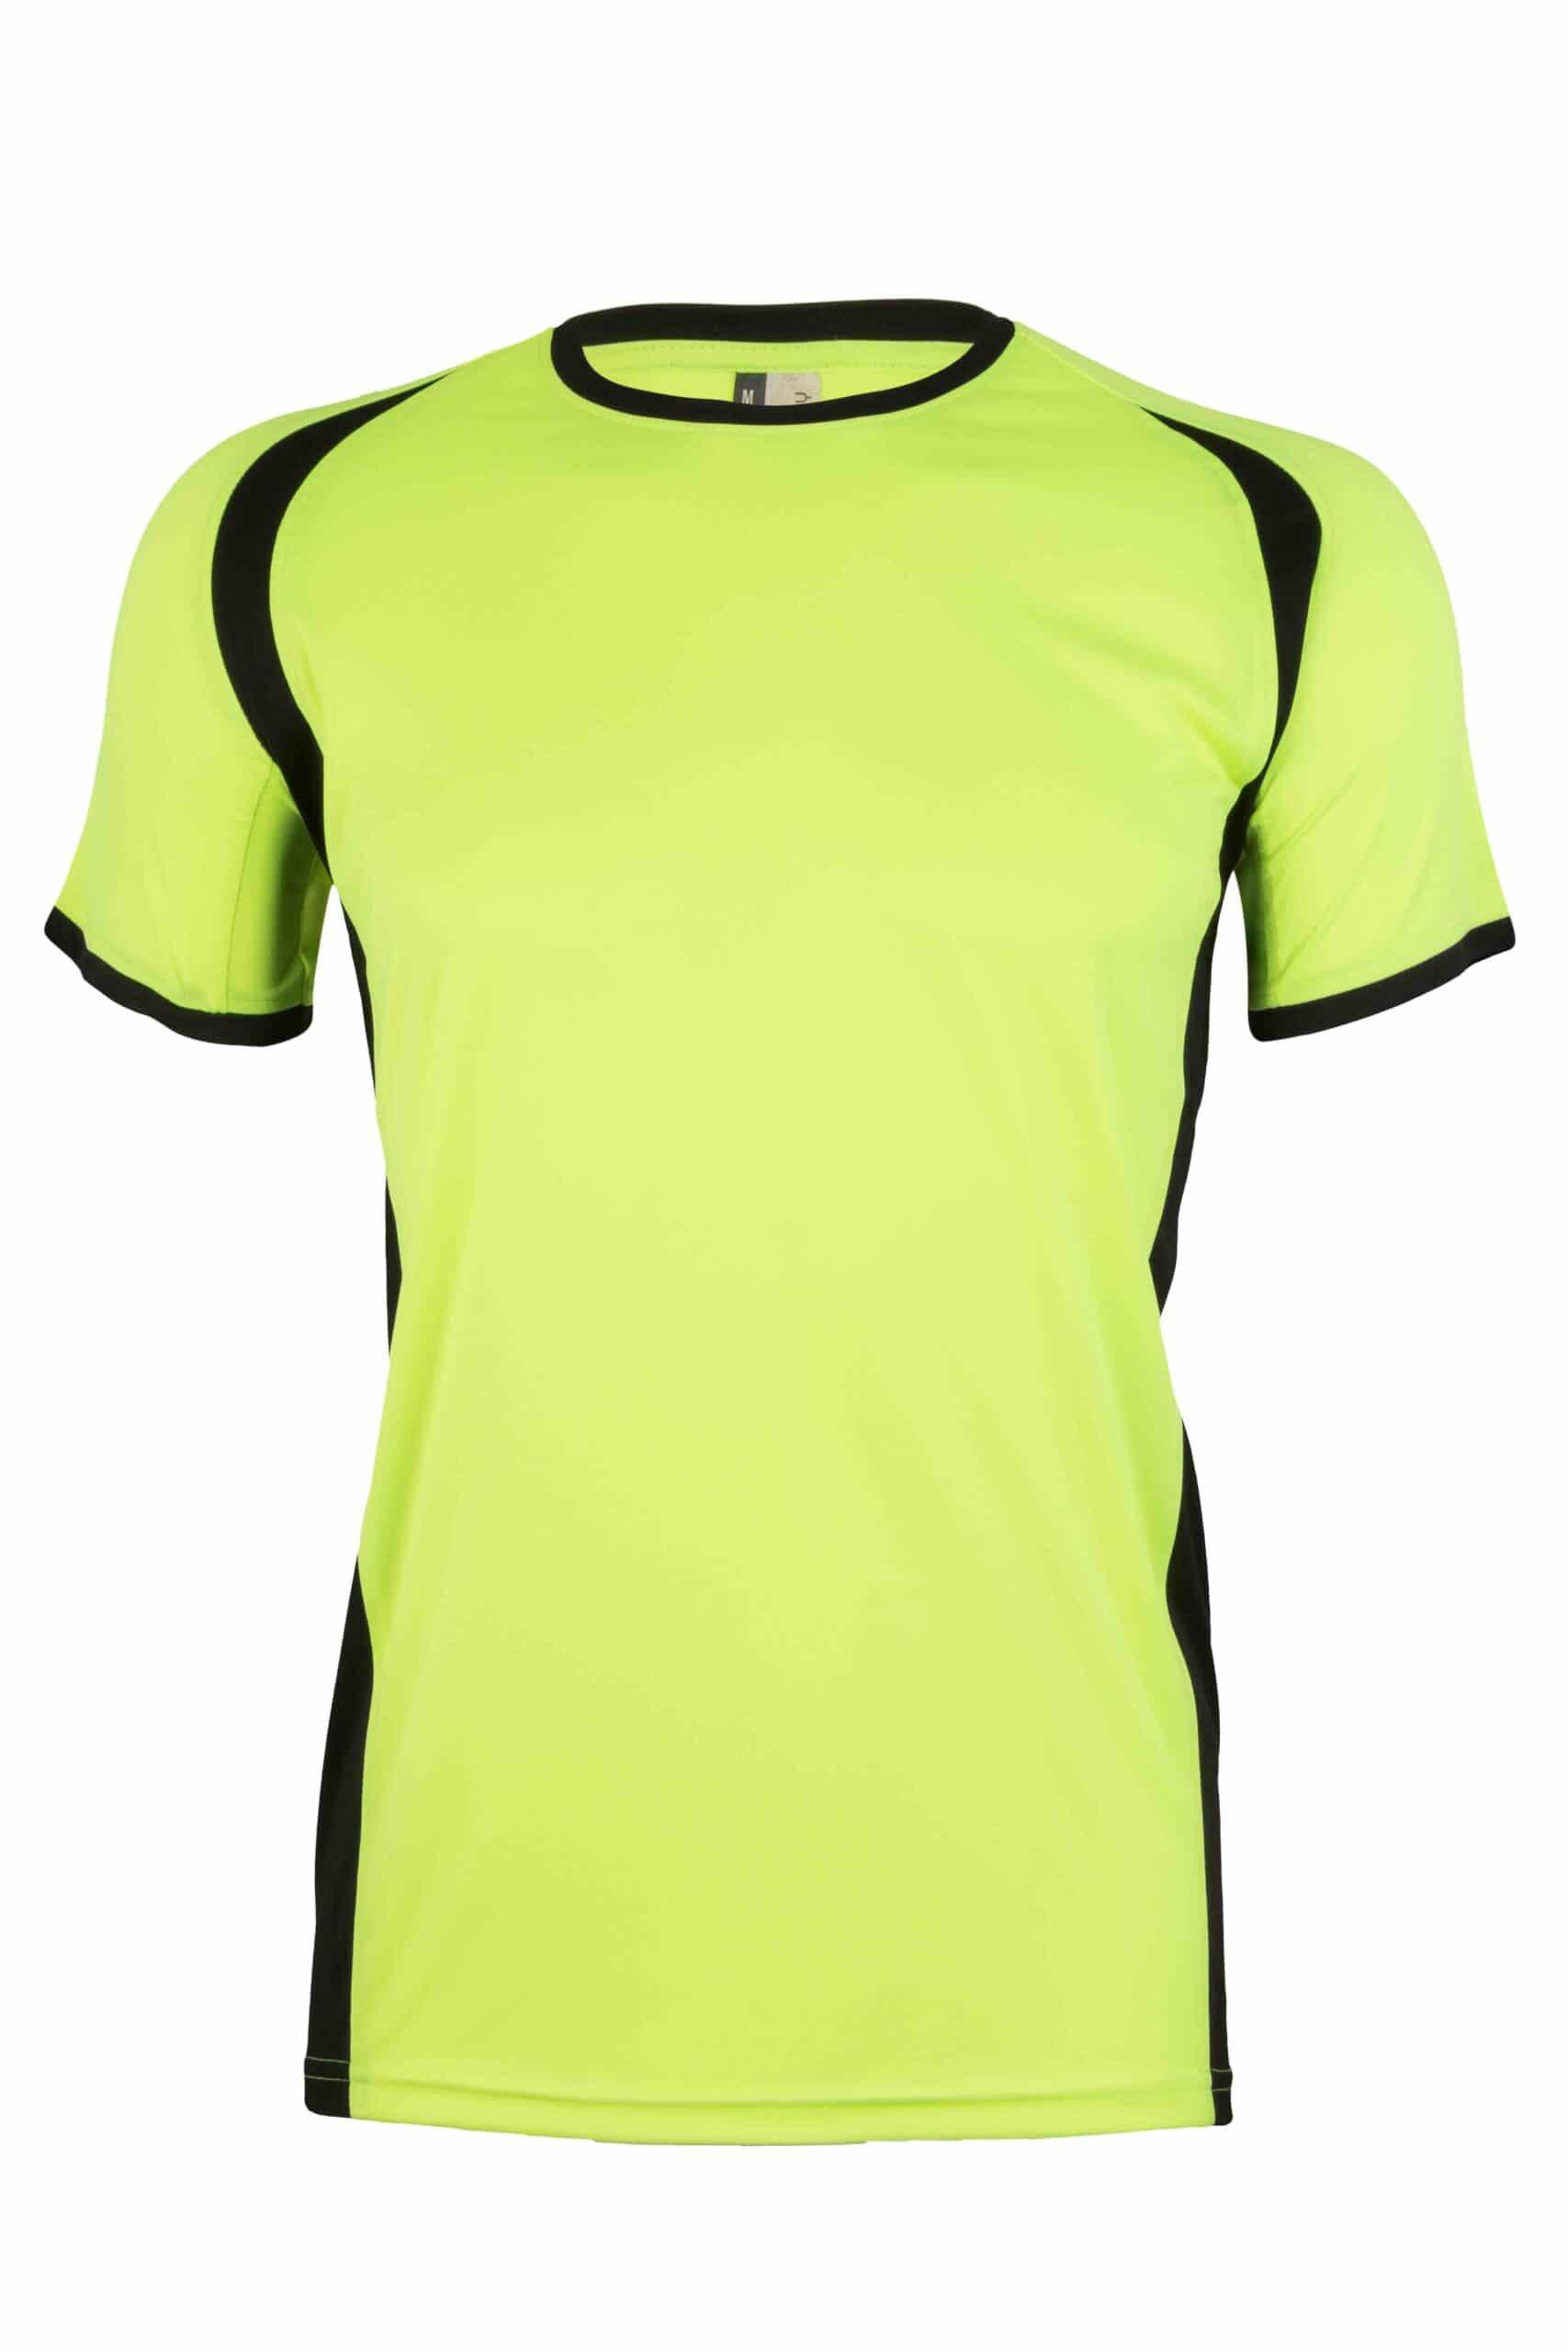 Mukua Mk530v Mukua Camiseta TÉcnica Manga Corta Bicolor FlÚor Yellow Blak 1